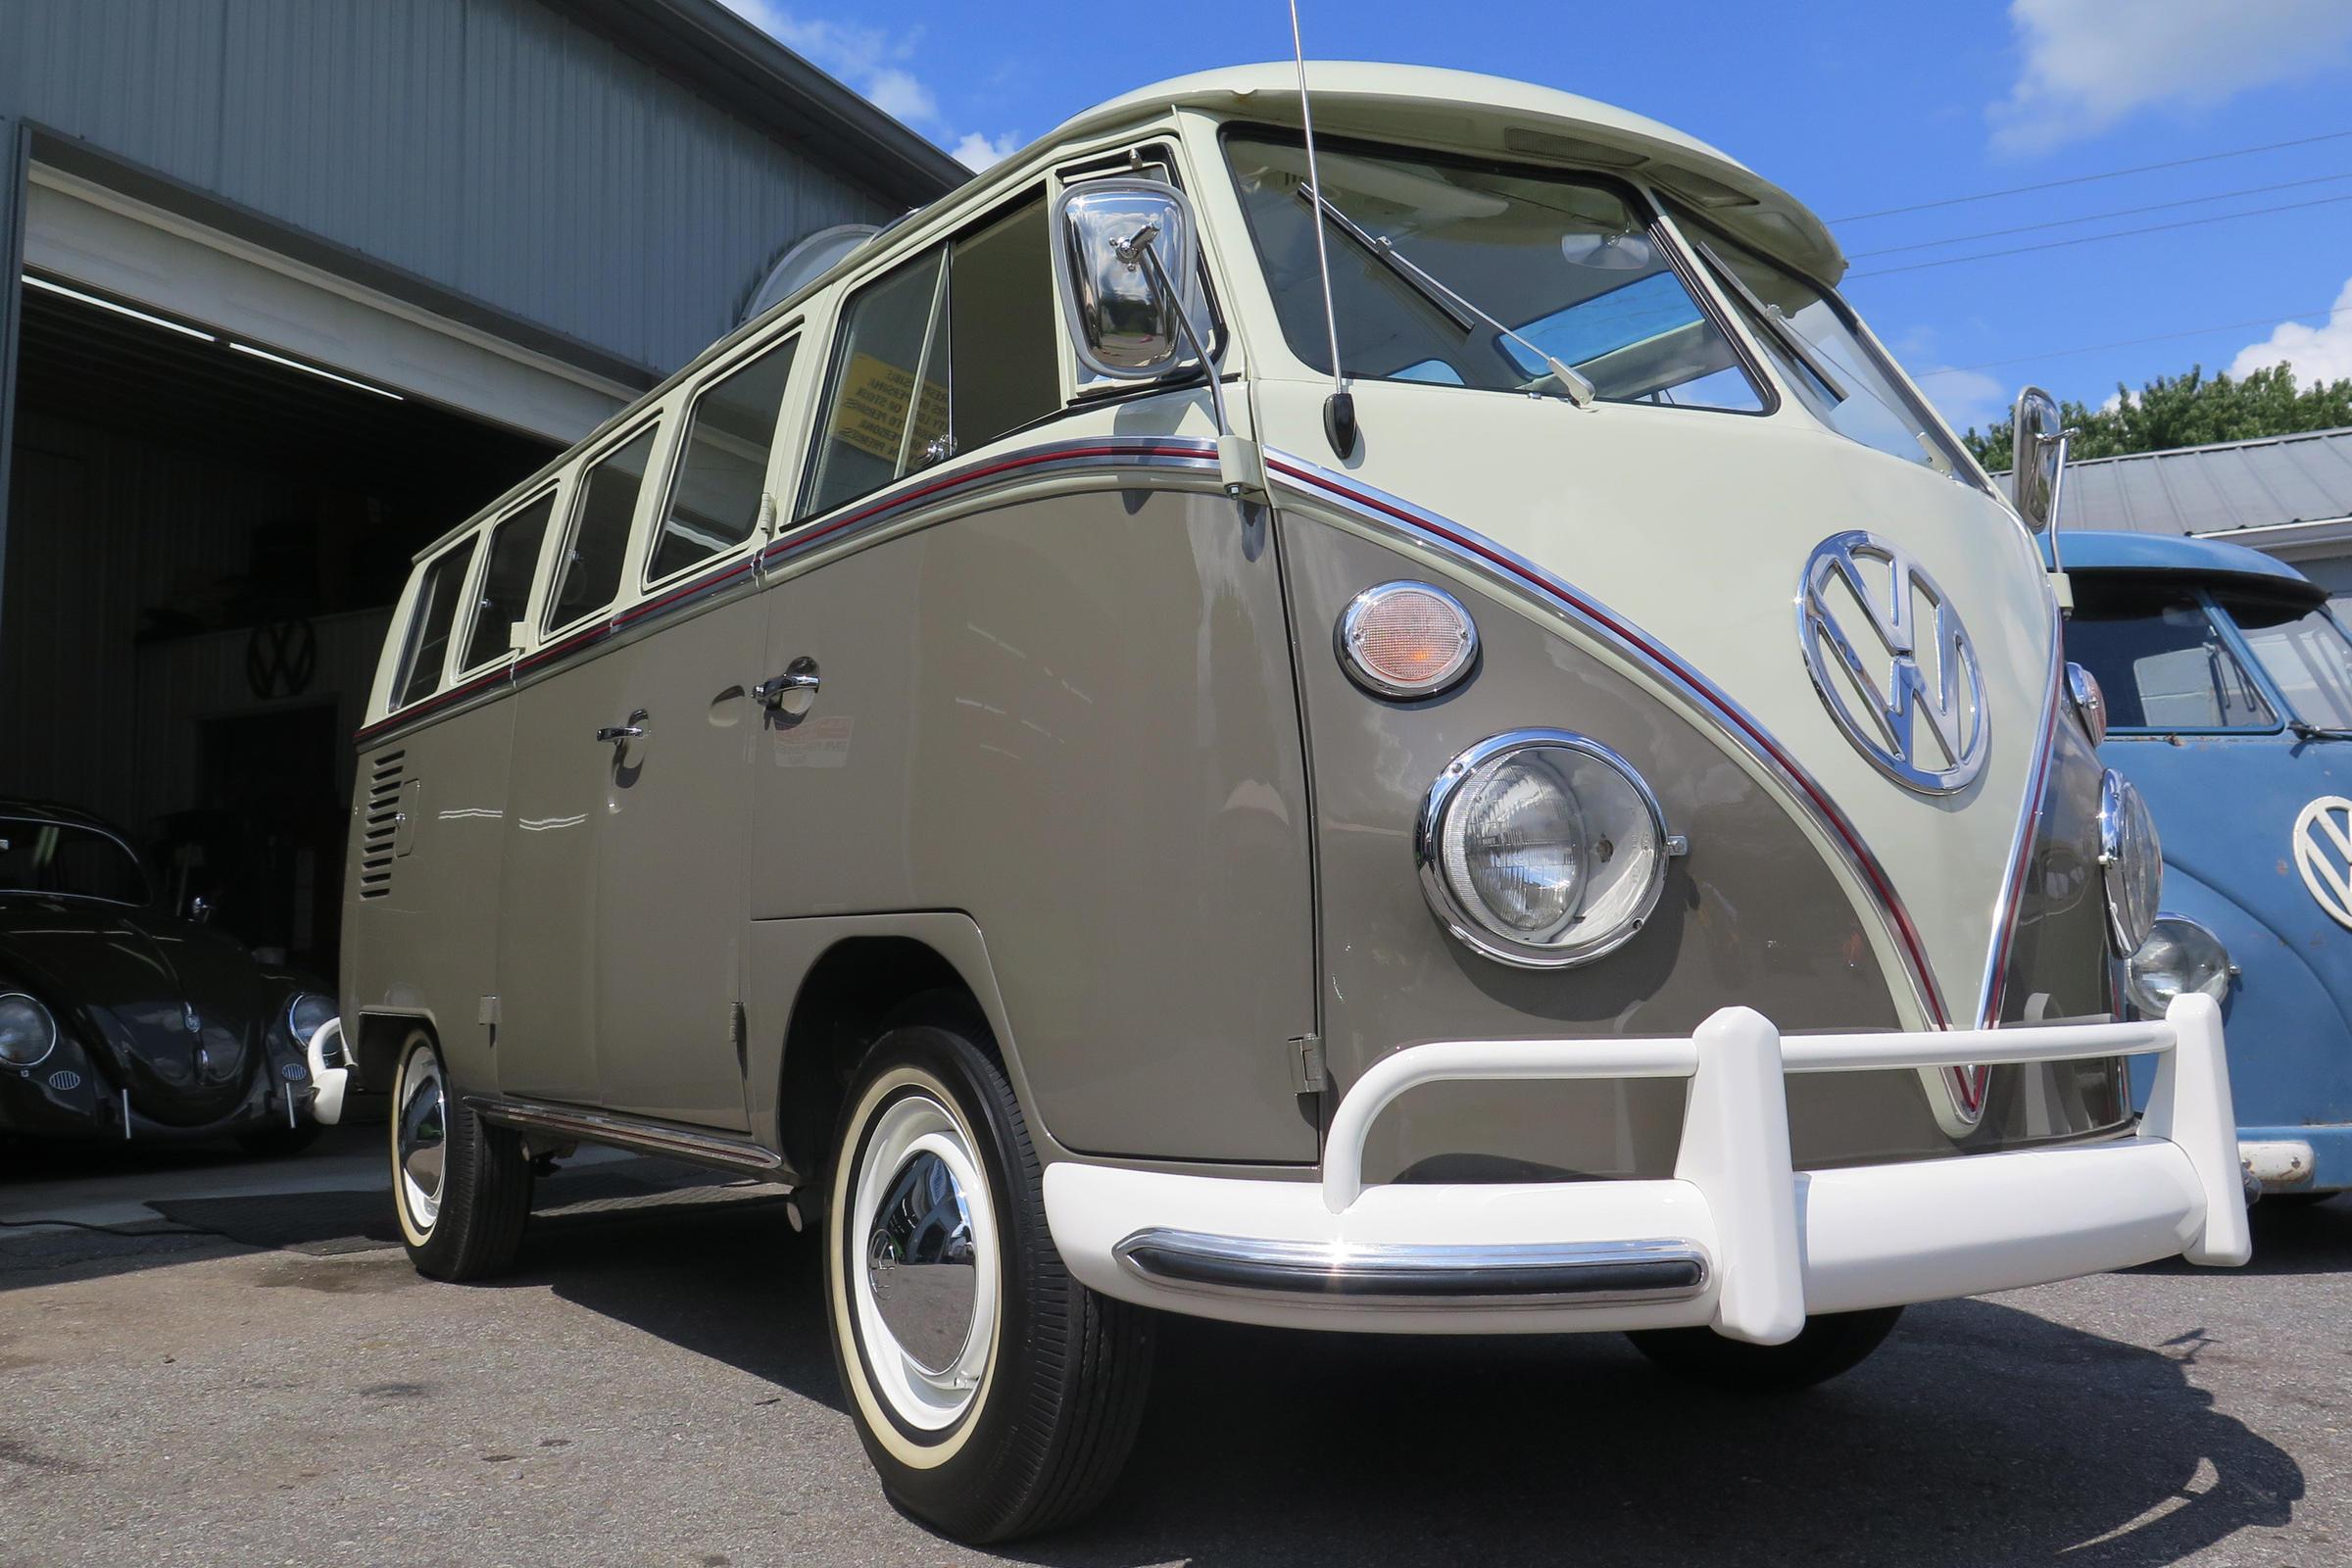 Restoring Vw Beetles Buses And Dreams Wwno